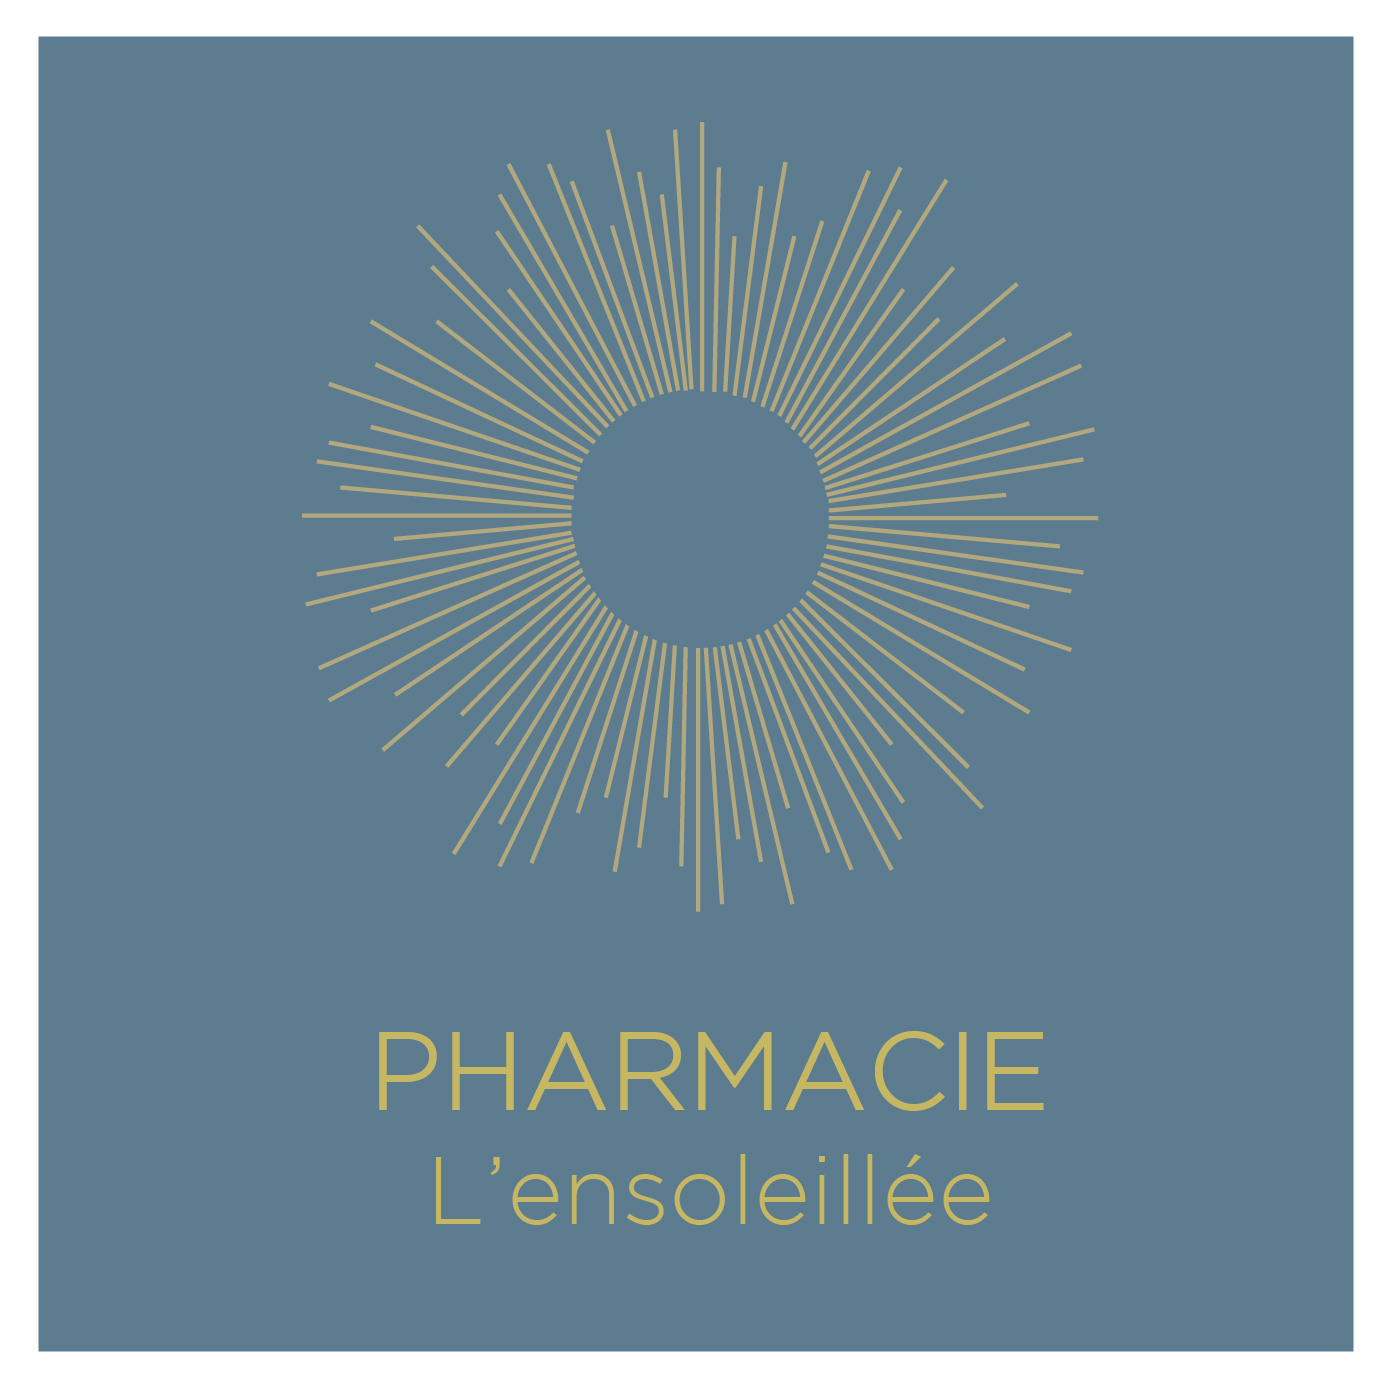 PHARMACIE L'ENSOLEILLEE –  AIX EN PROVENCE (13) 33